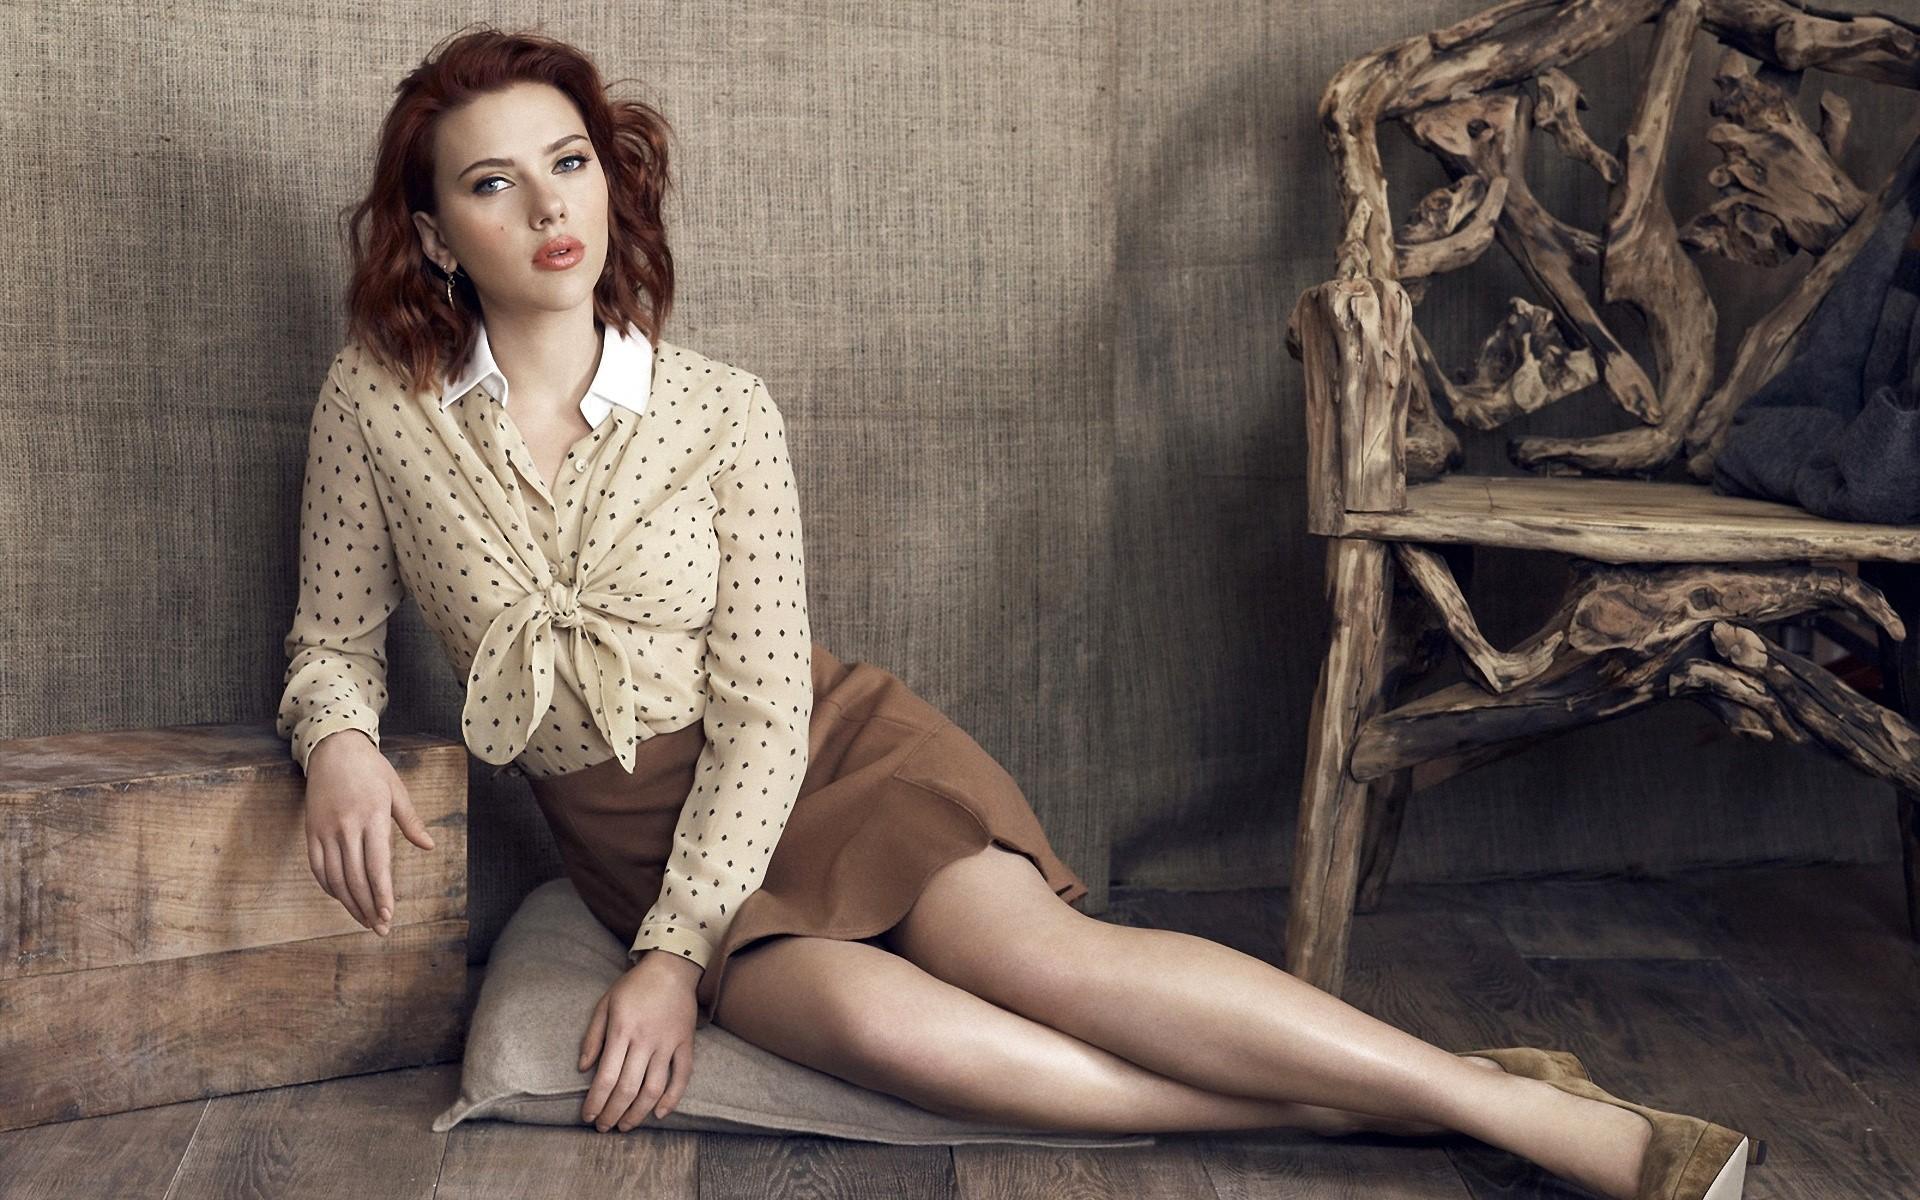 Wallpaper Scarlett Johansson on the floor